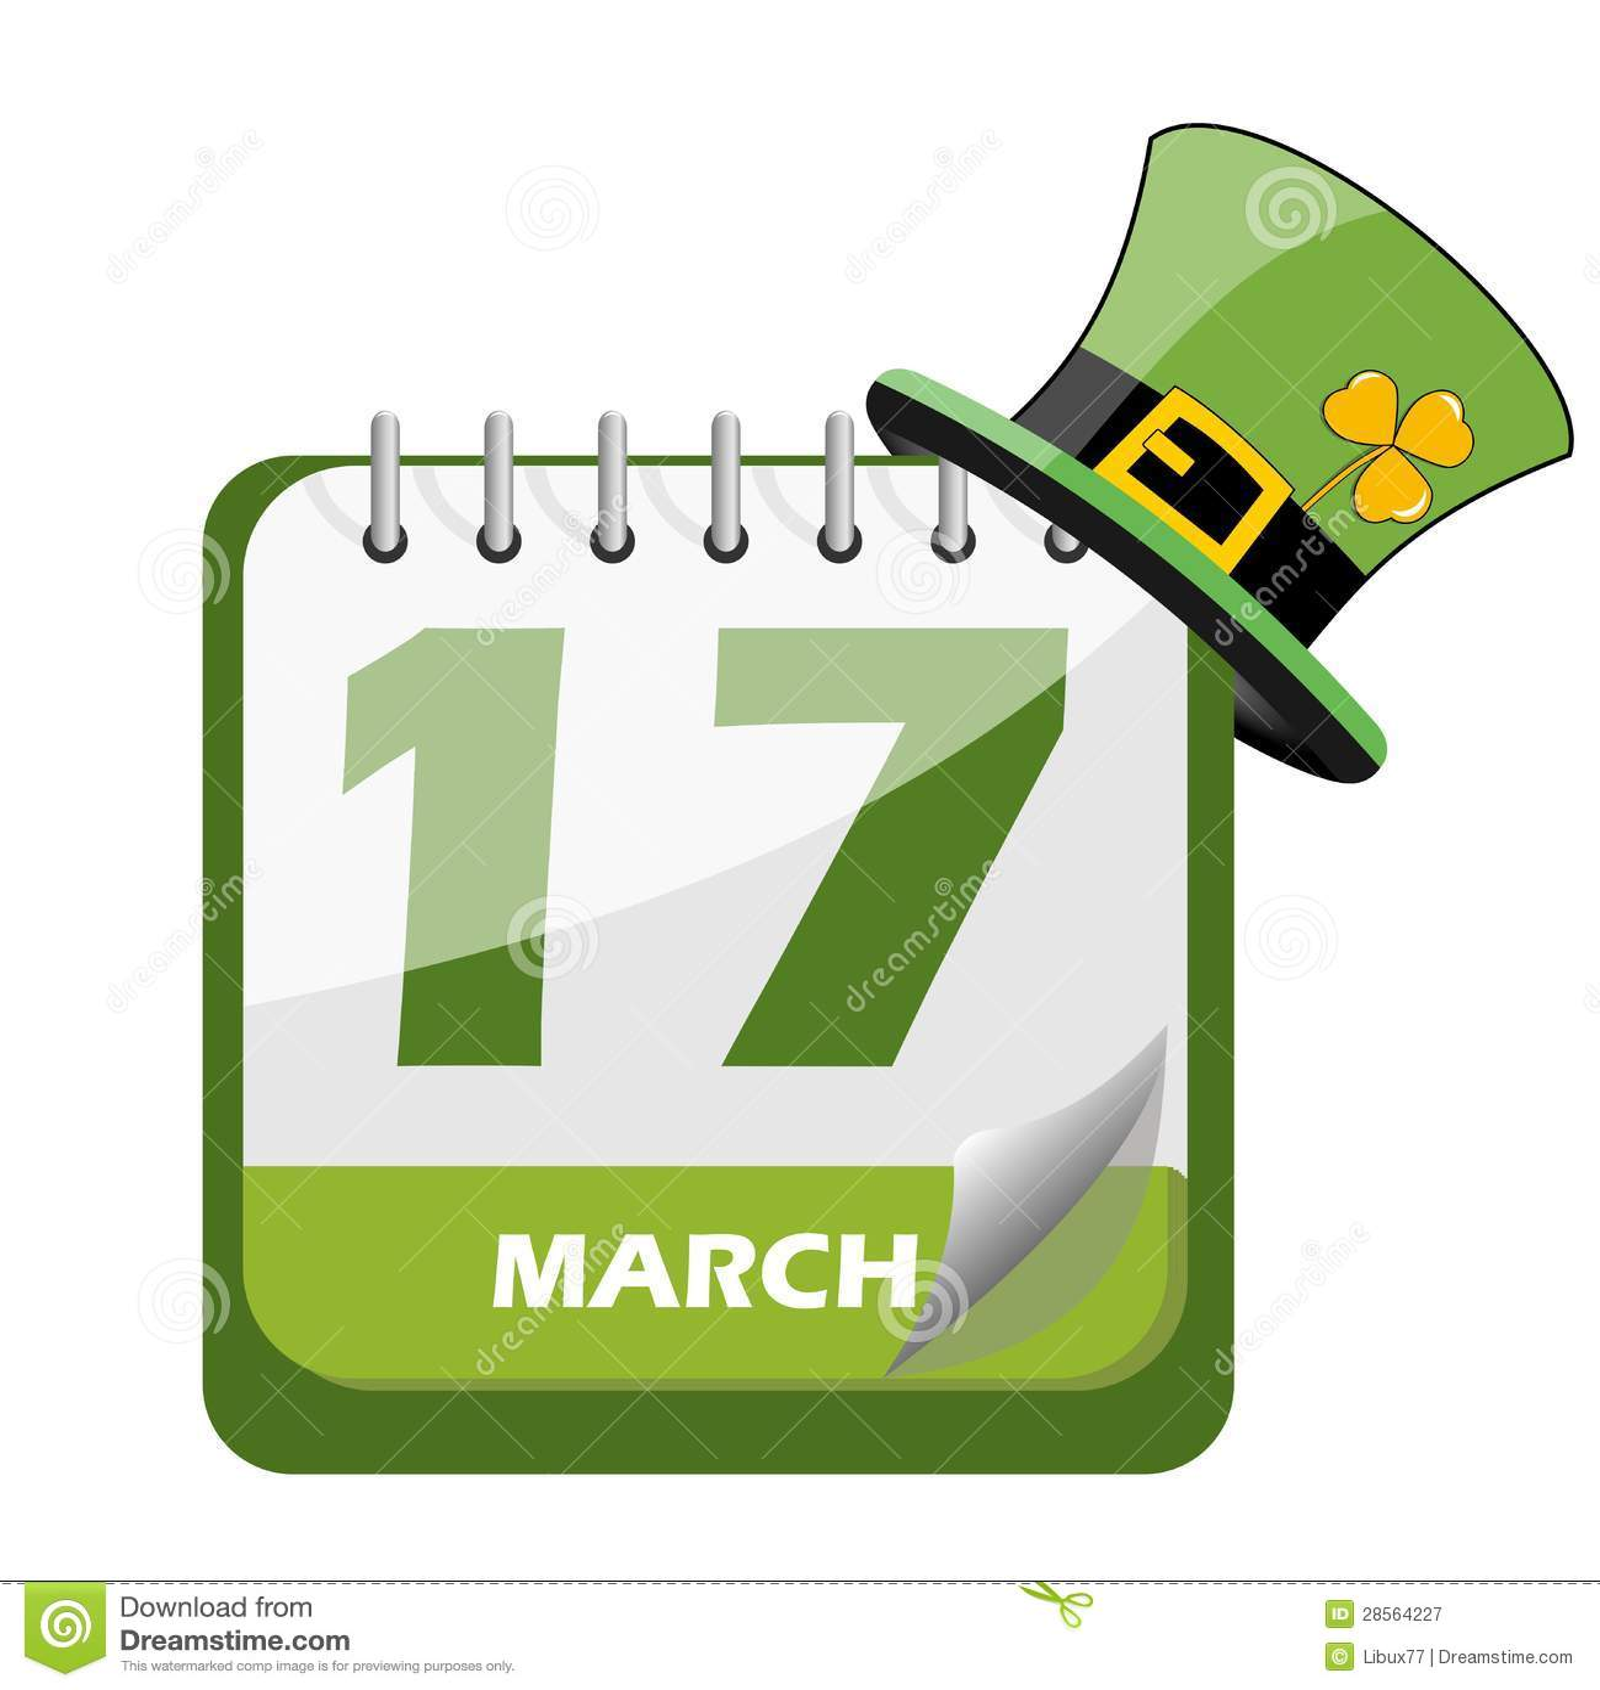 Saint Patrick S Day Calendar Stock Vector - Illustration of patrick, beer: 28564227